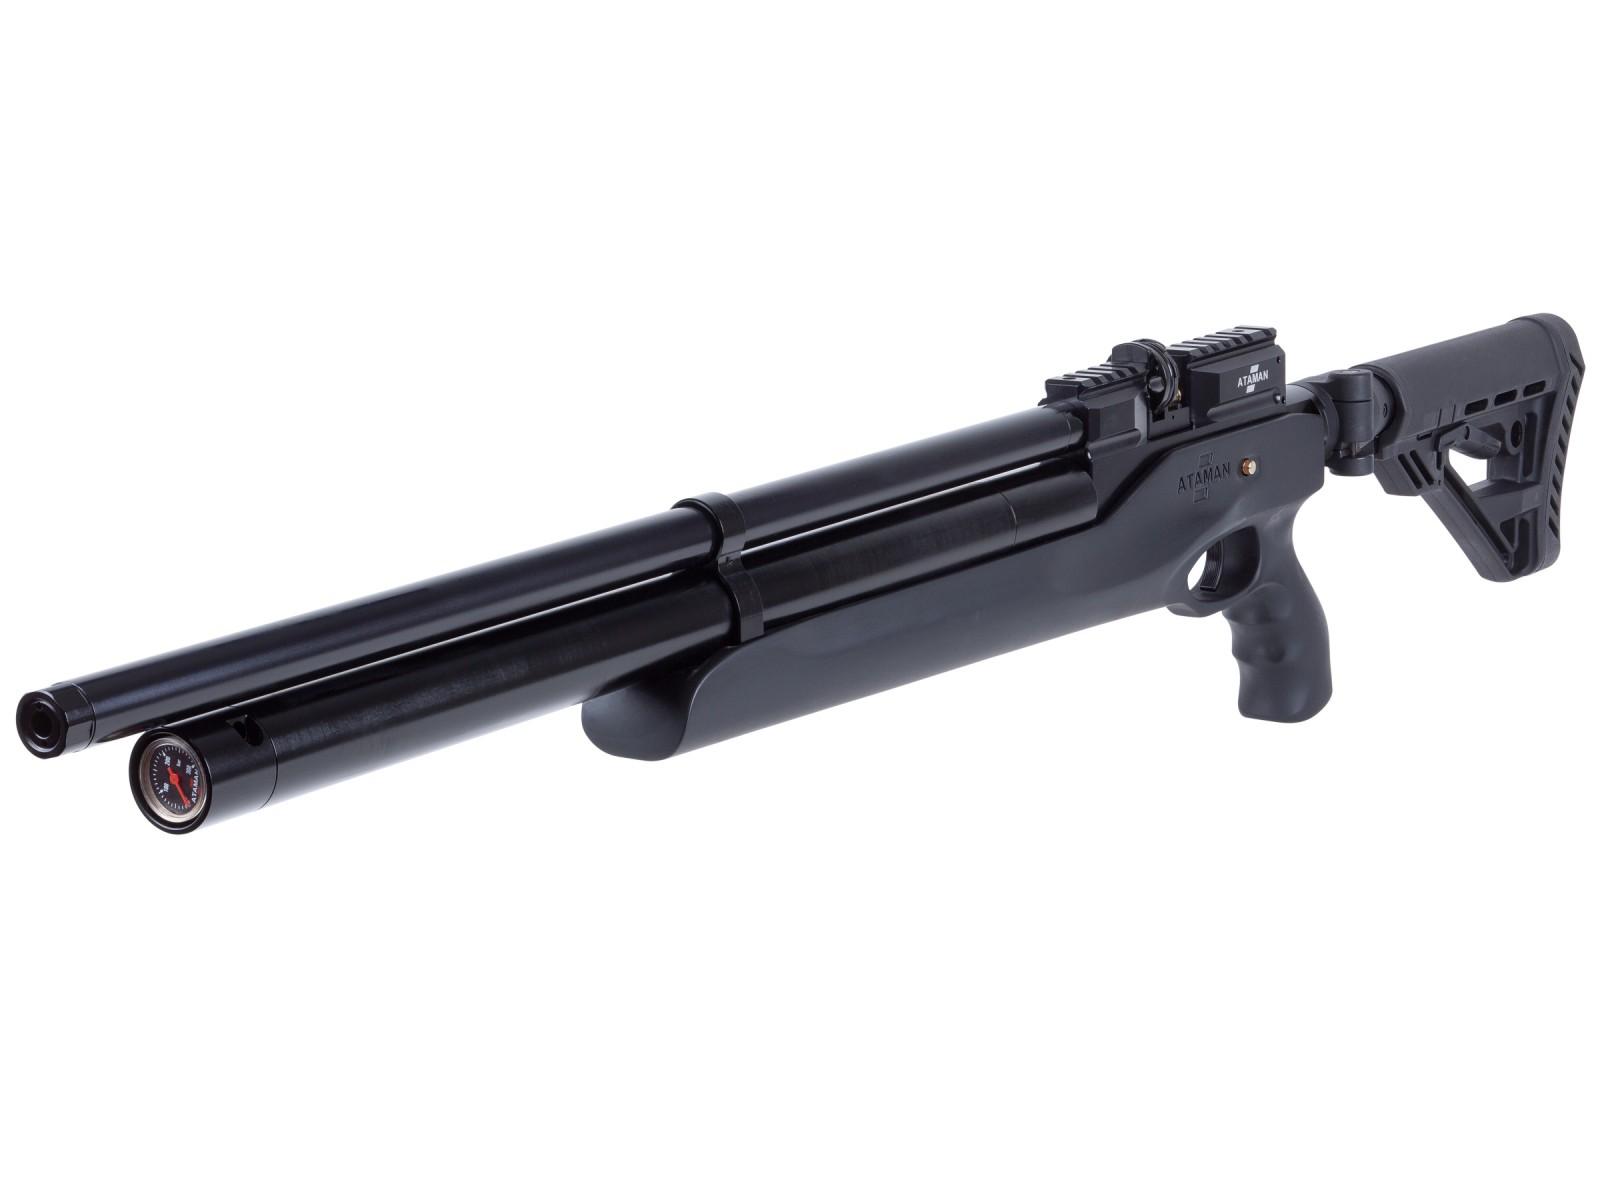 Ataman M2R Tact Carbine Type 4 Compact Air Rifle, Black